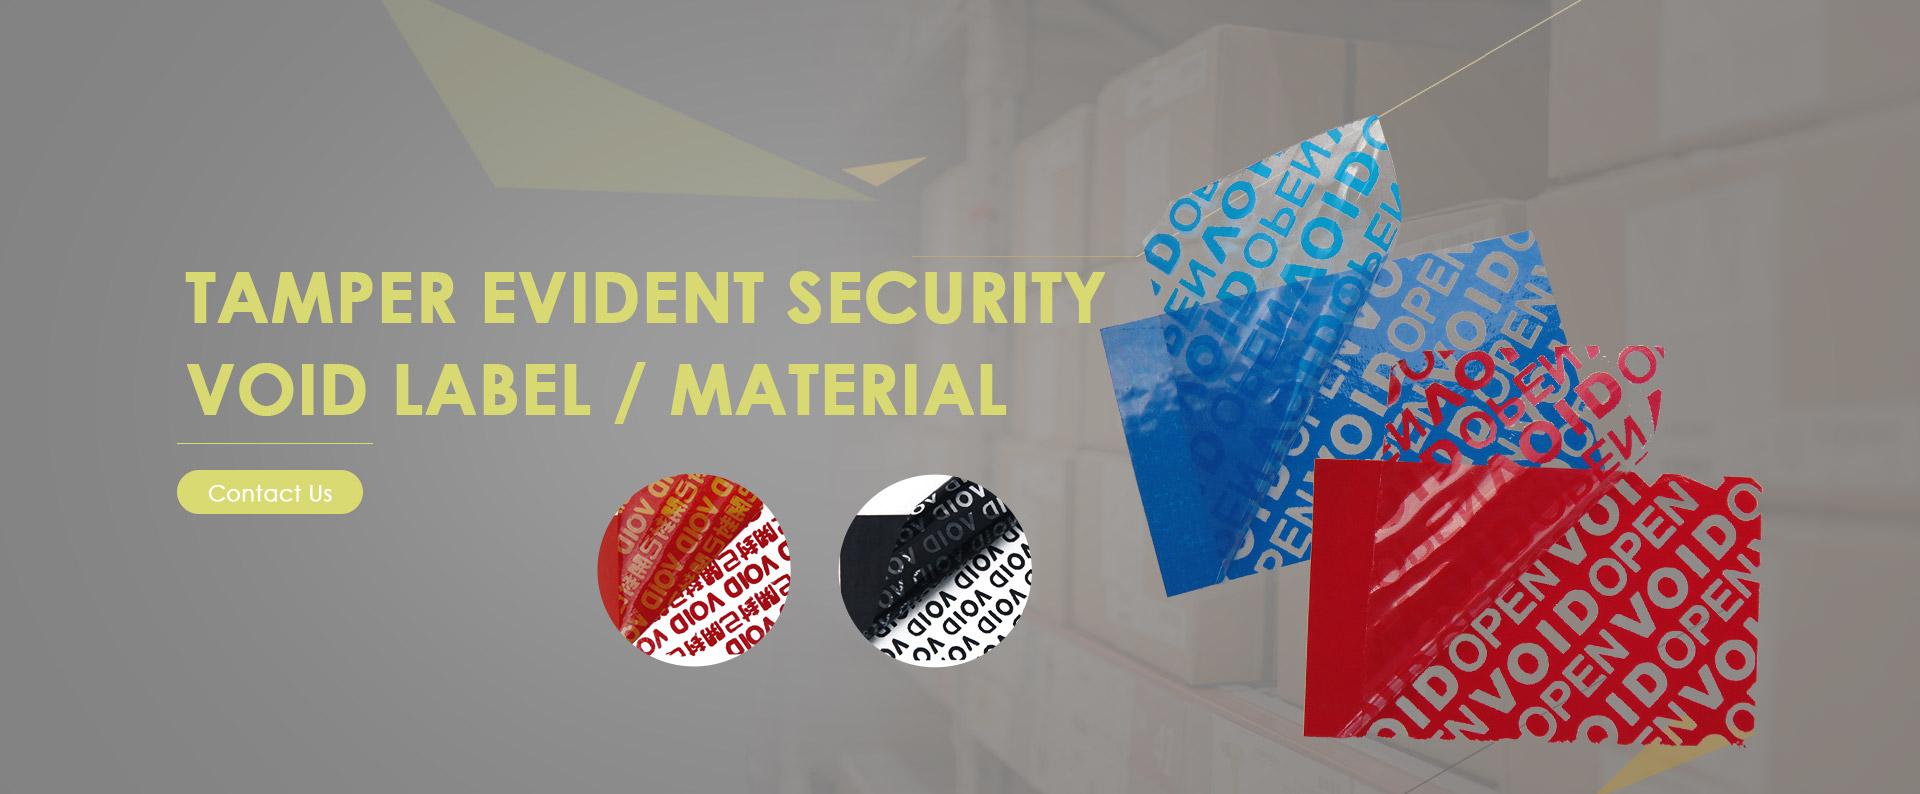 Tamper Evident Void Material & Label